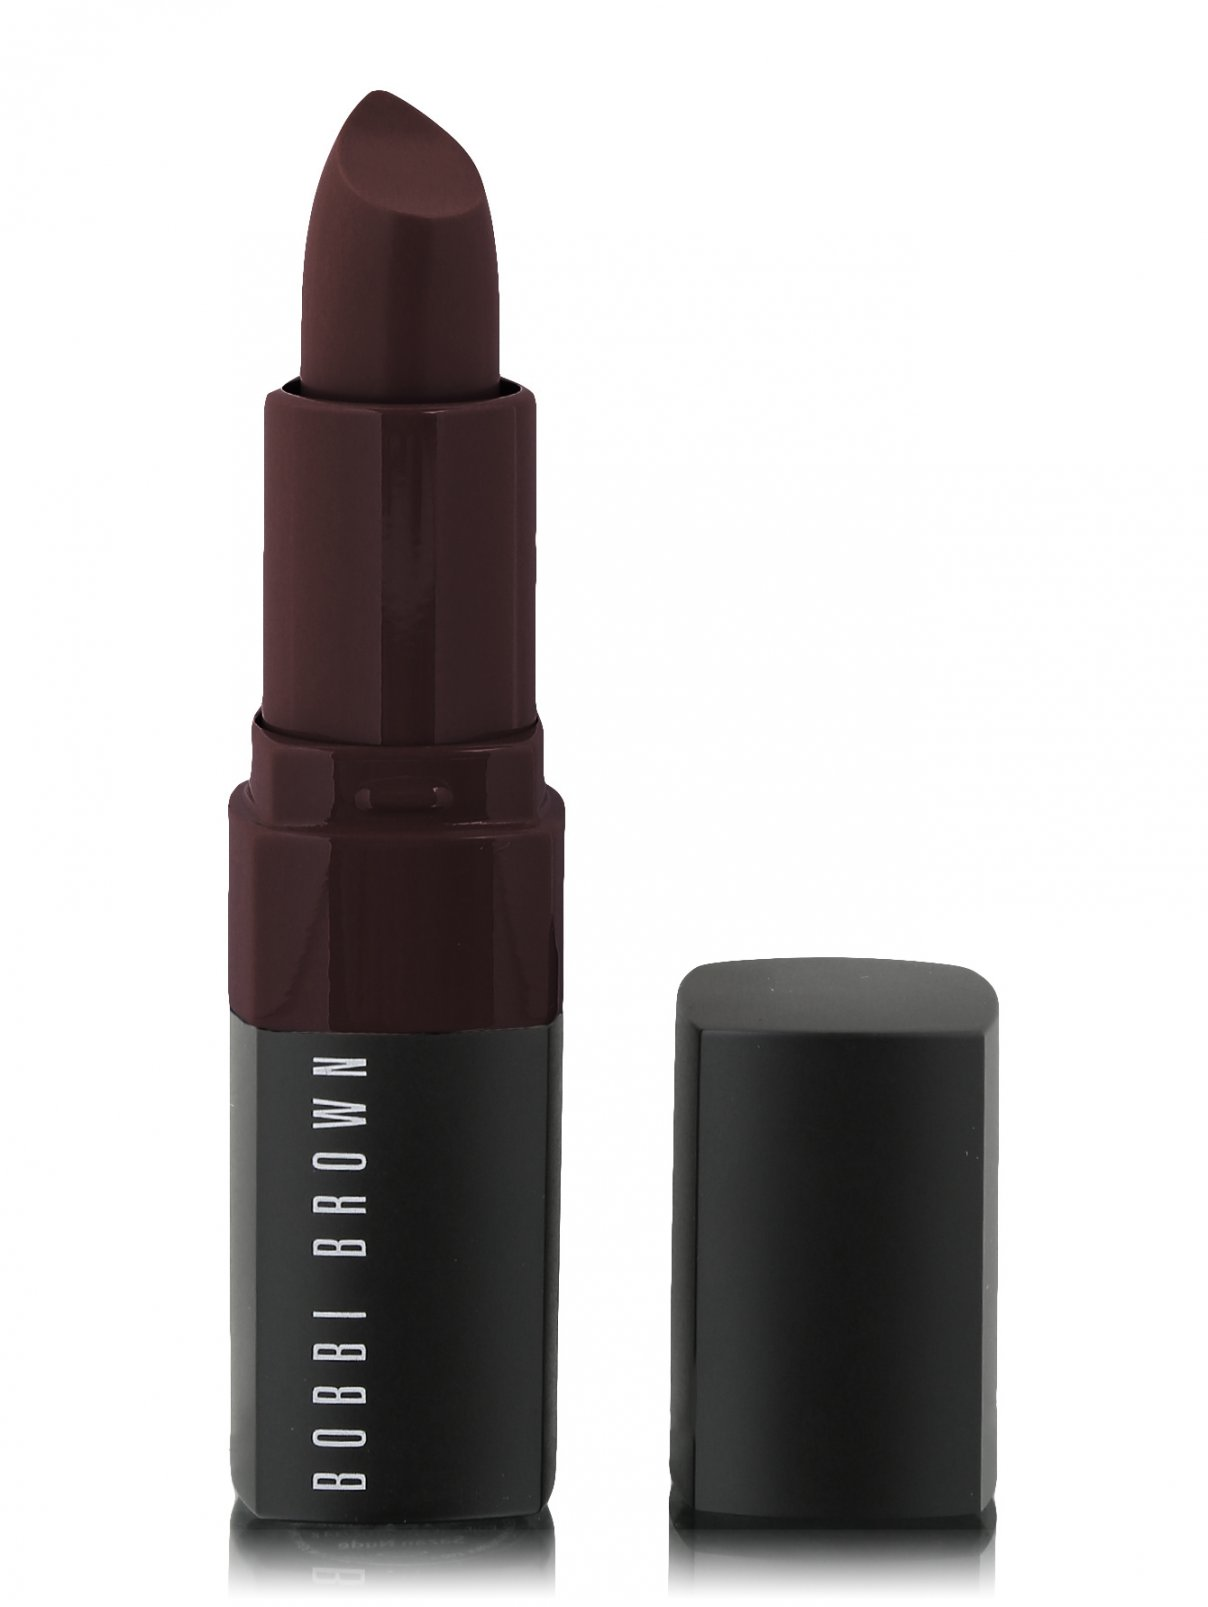 Помада Crushed Lip Color Bobbi Brown  –  Общий вид